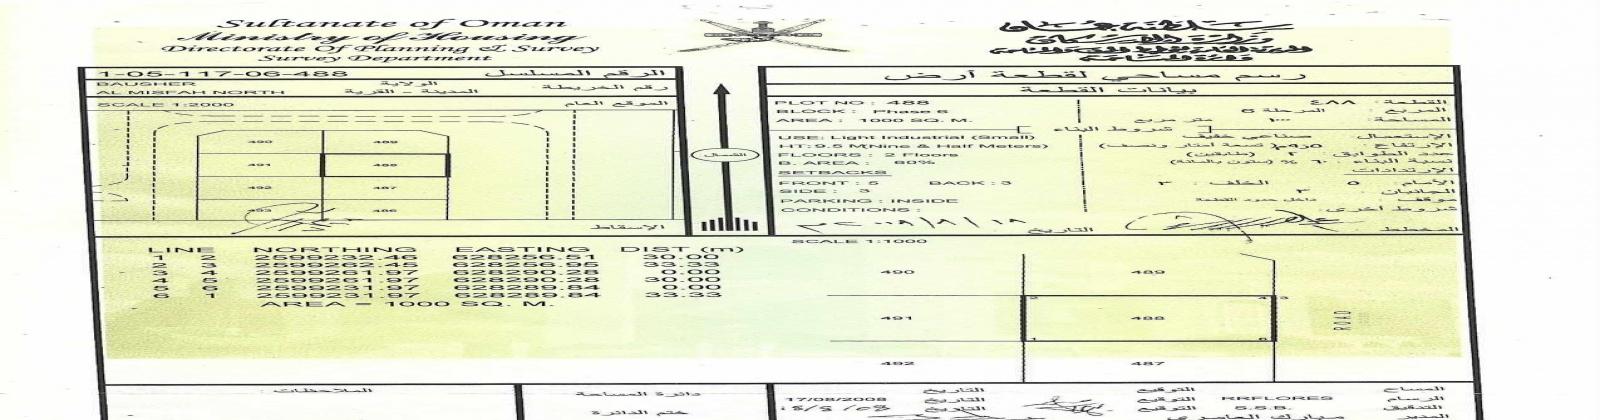 Muscat,Land,1011